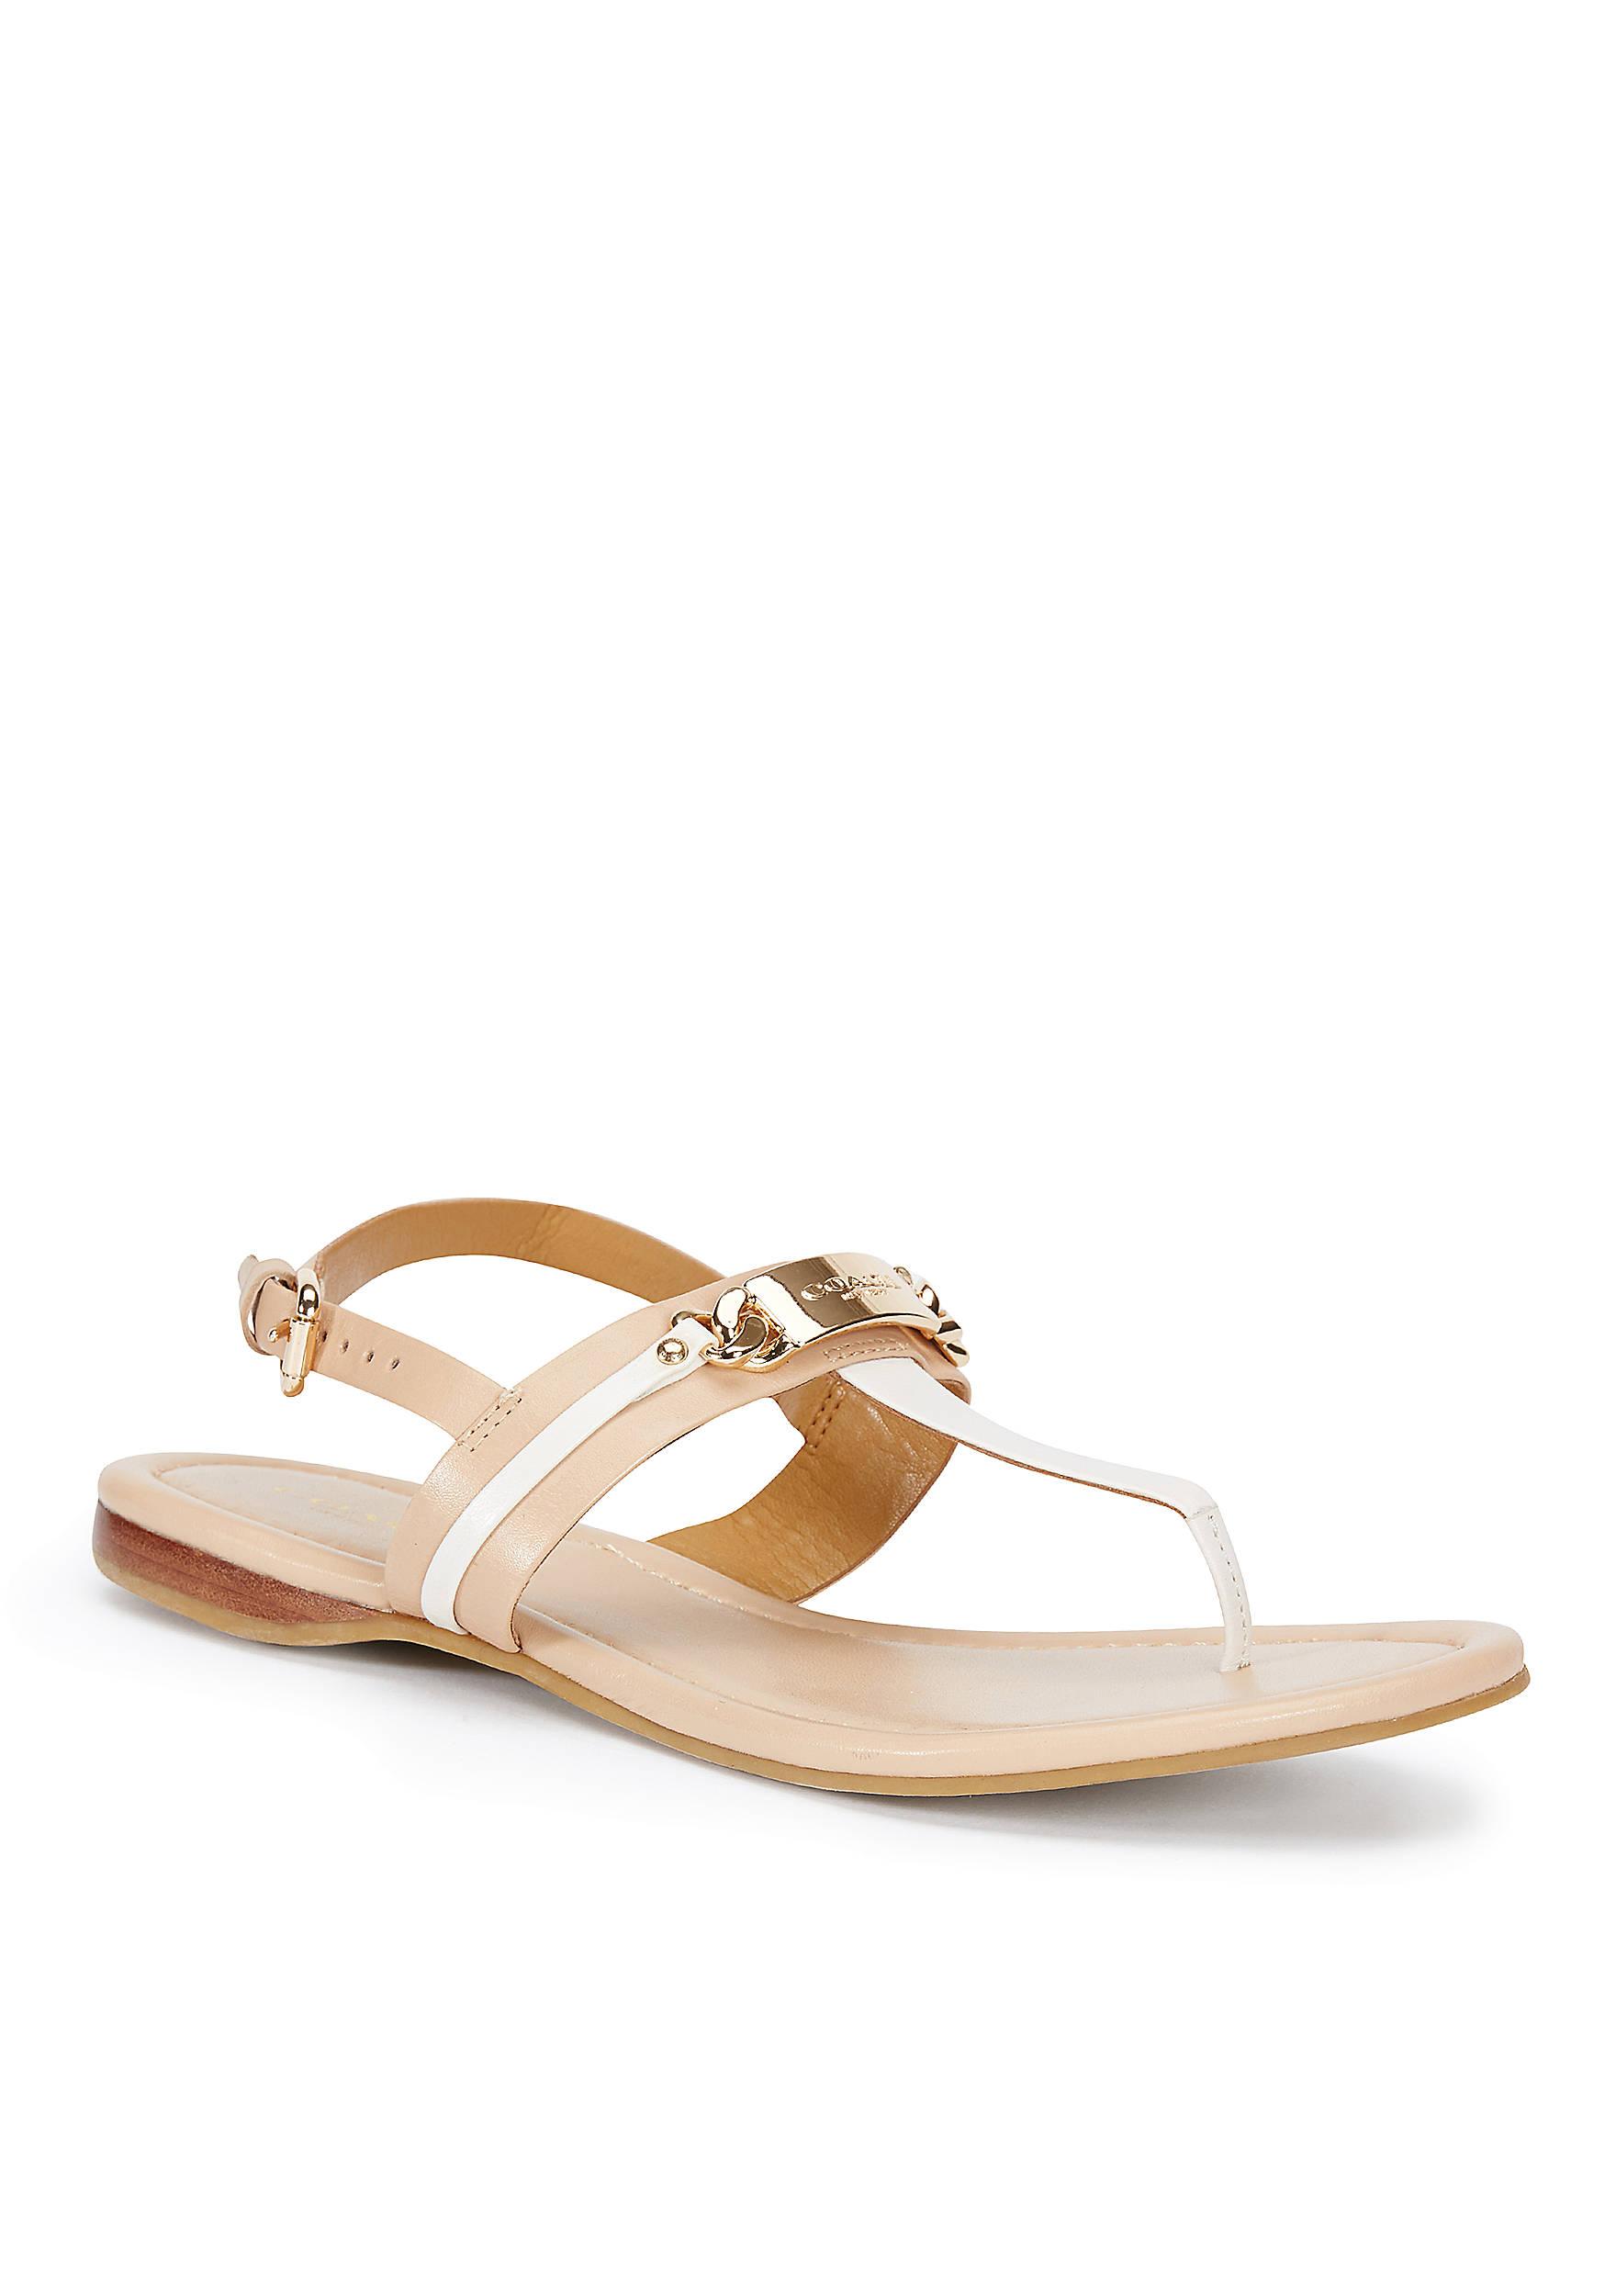 Womens Sandals COACH Caterine Beechwood